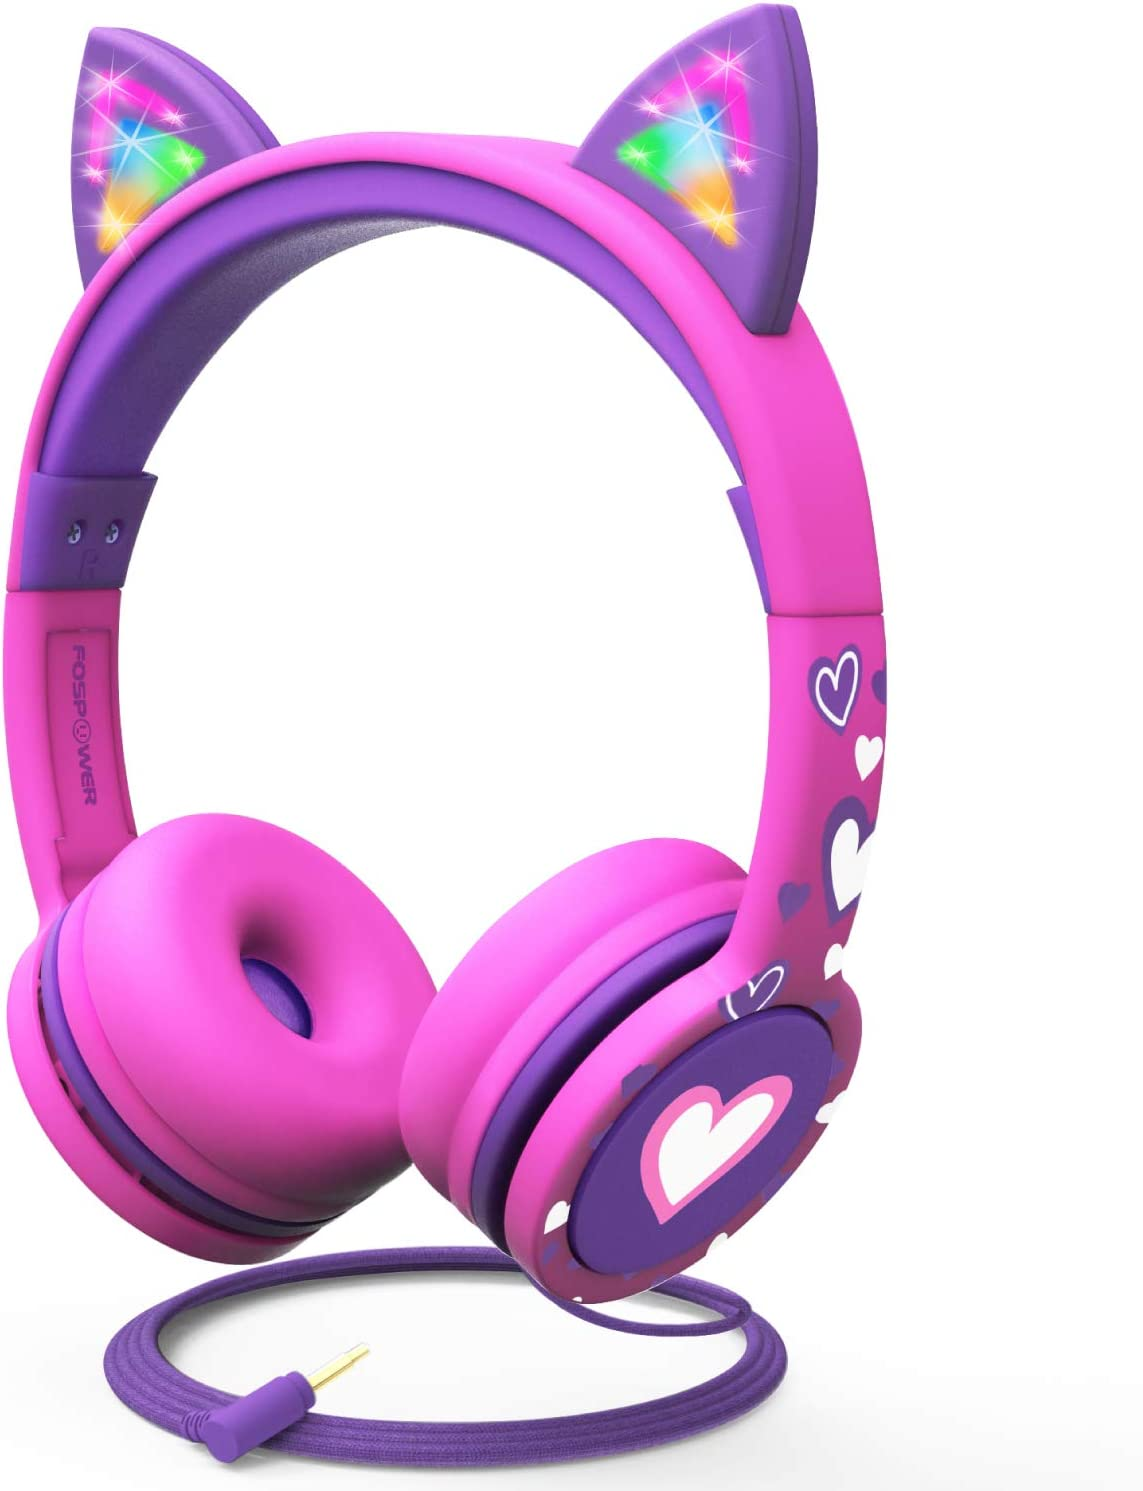 Over-Ear-Kopfh/örer mit Lautst/ärkeregler f/ür iPhone//iPad//Smartphones//Laptop//PC Katzenohren Pink und Grau LED kabellos Kinder-Bluetooth-Kopfh/örer